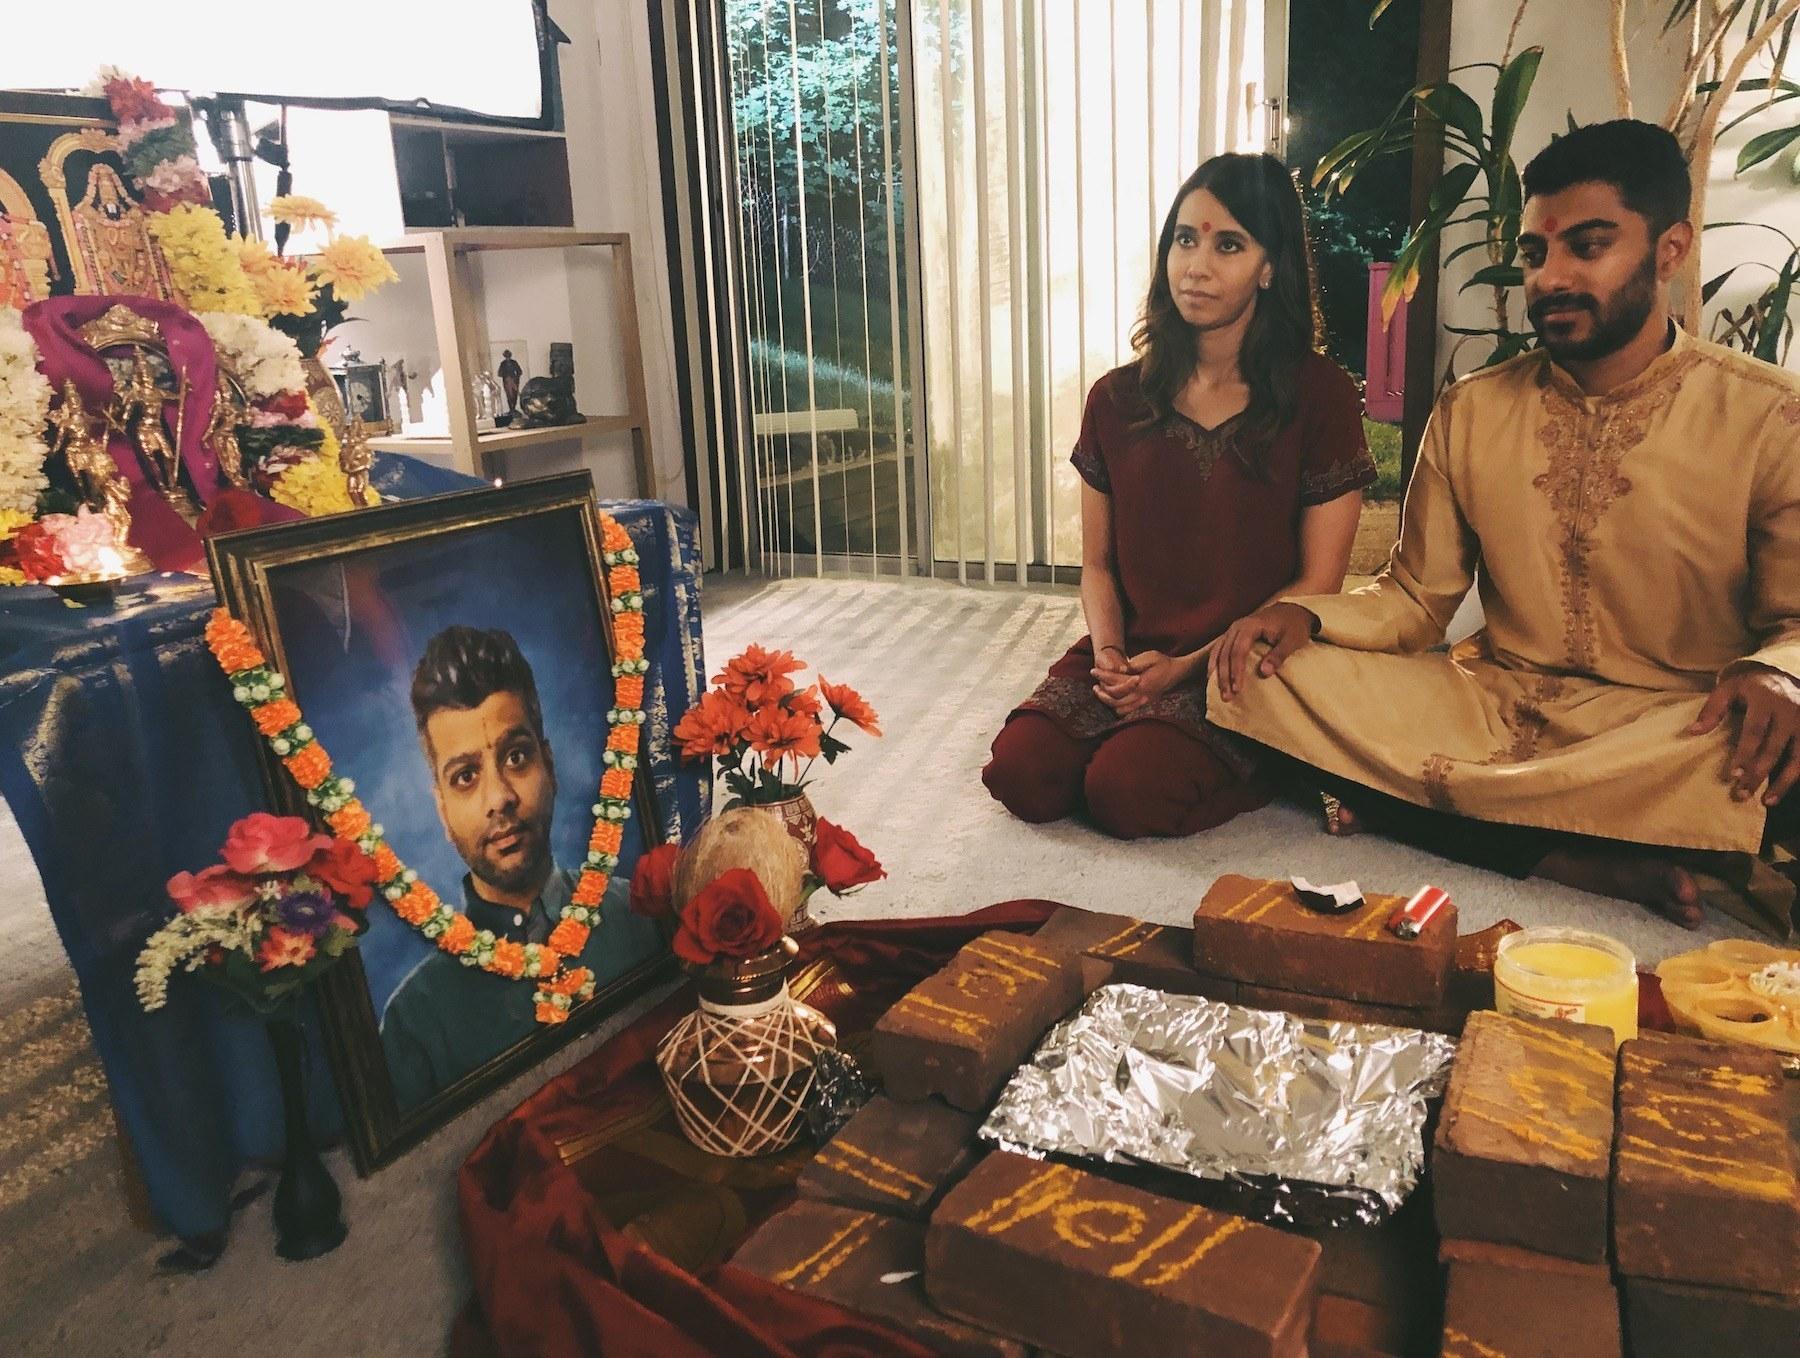 Sujata and Ritesh filming a scene together